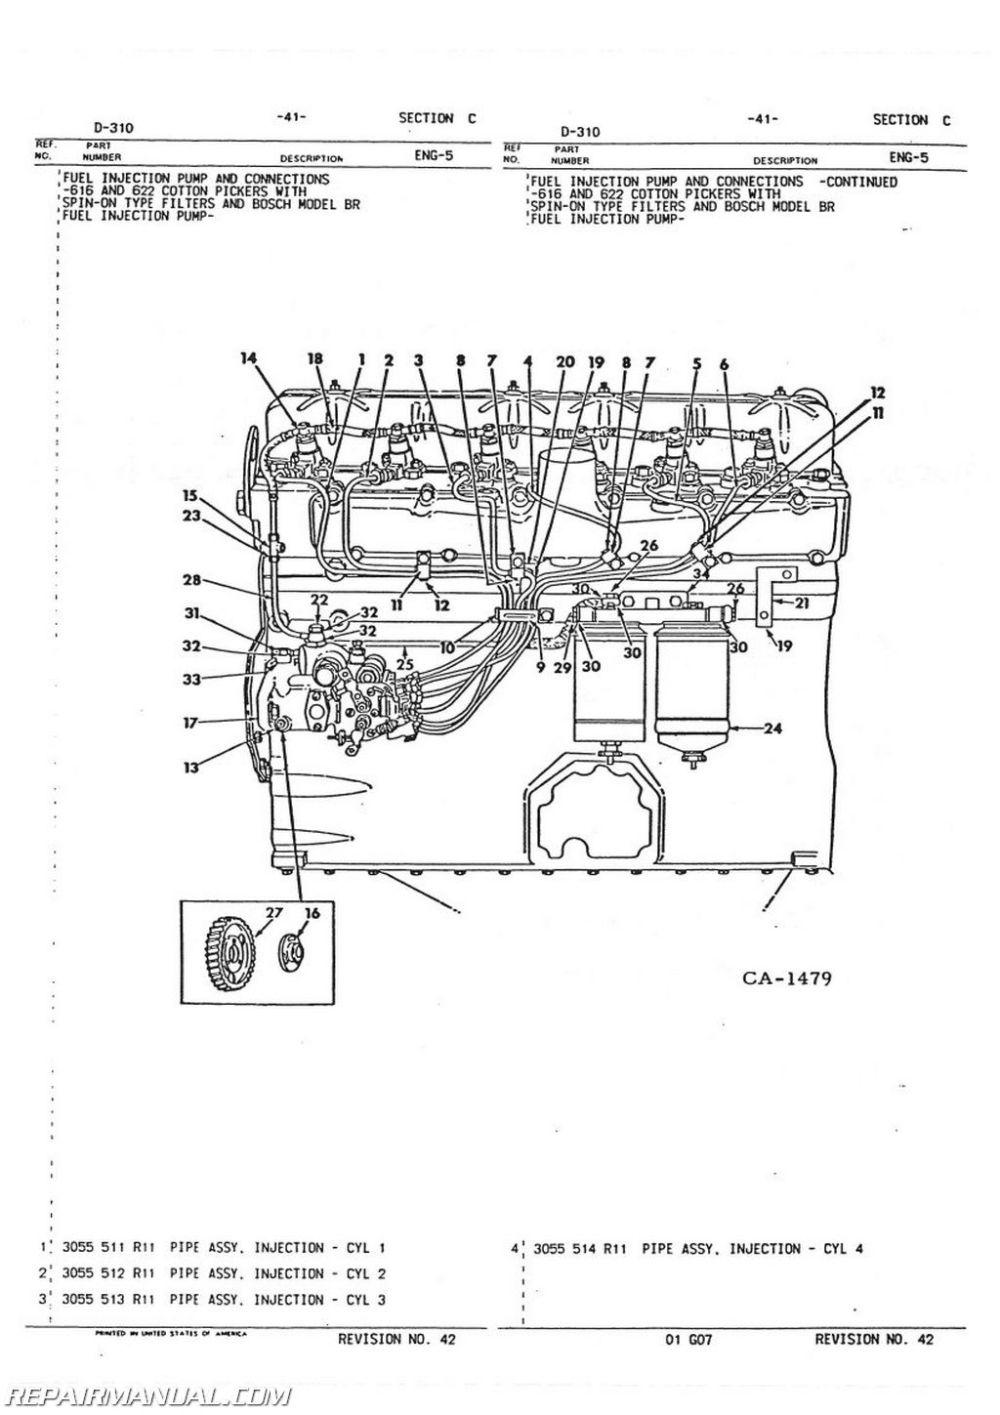 medium resolution of dt466e engine diagram wiring diagram datainternational dt466e engine diagram wiring diagram tutorial dt466 engine diagram dt466e